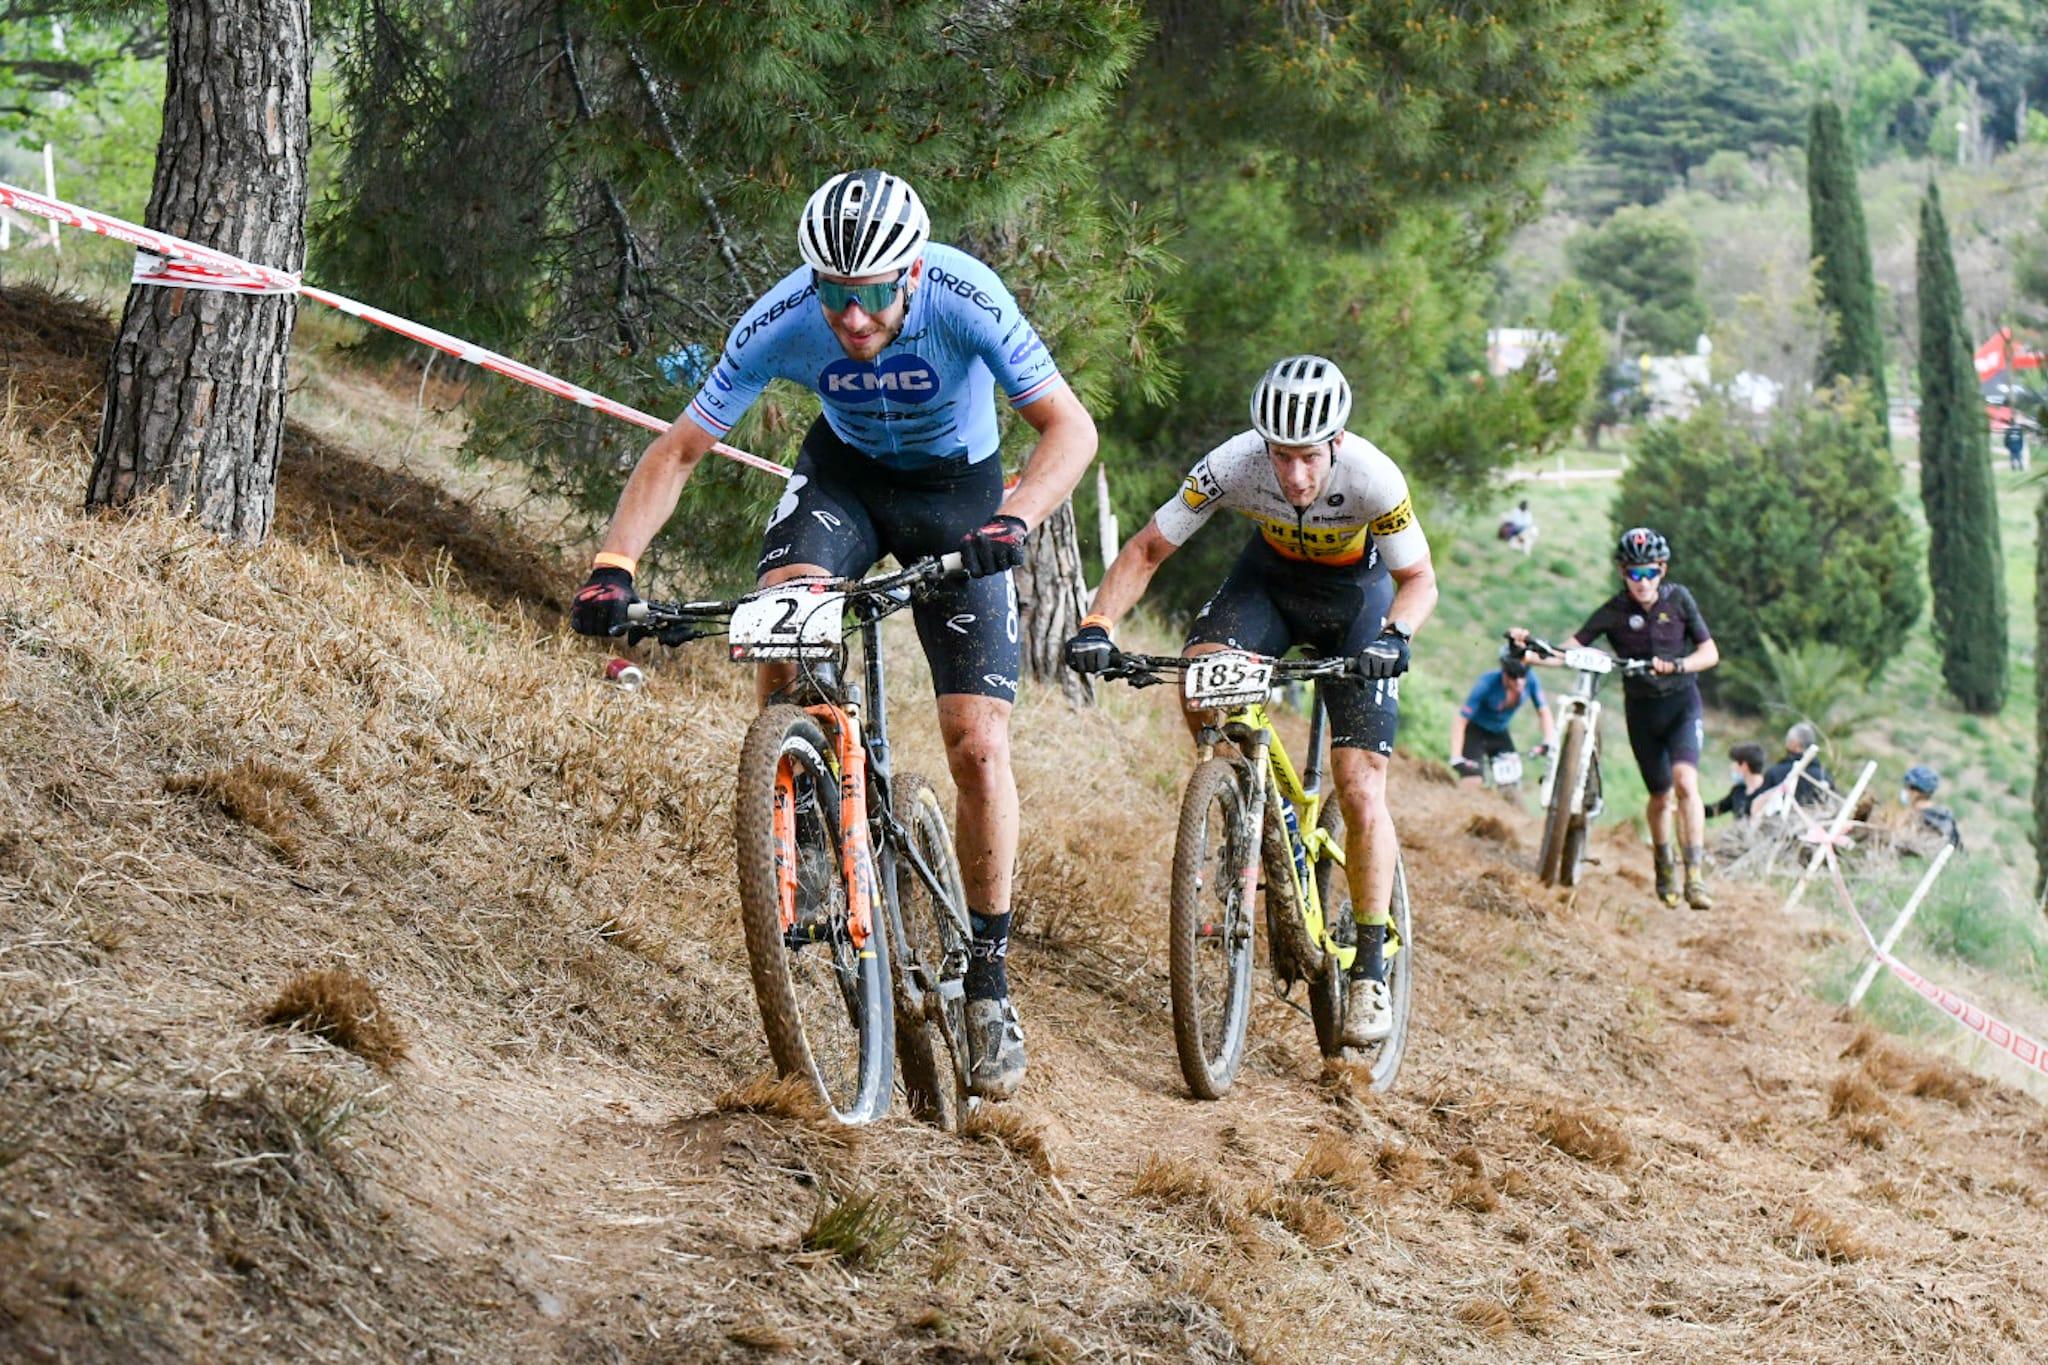 KORETZKY Y ROC�O DEL ALBA ESPRINTAN HAC�A EL TRIUNFO EN   LA CONTINENTAL SUPER CUP MASSI DE BARCELONA